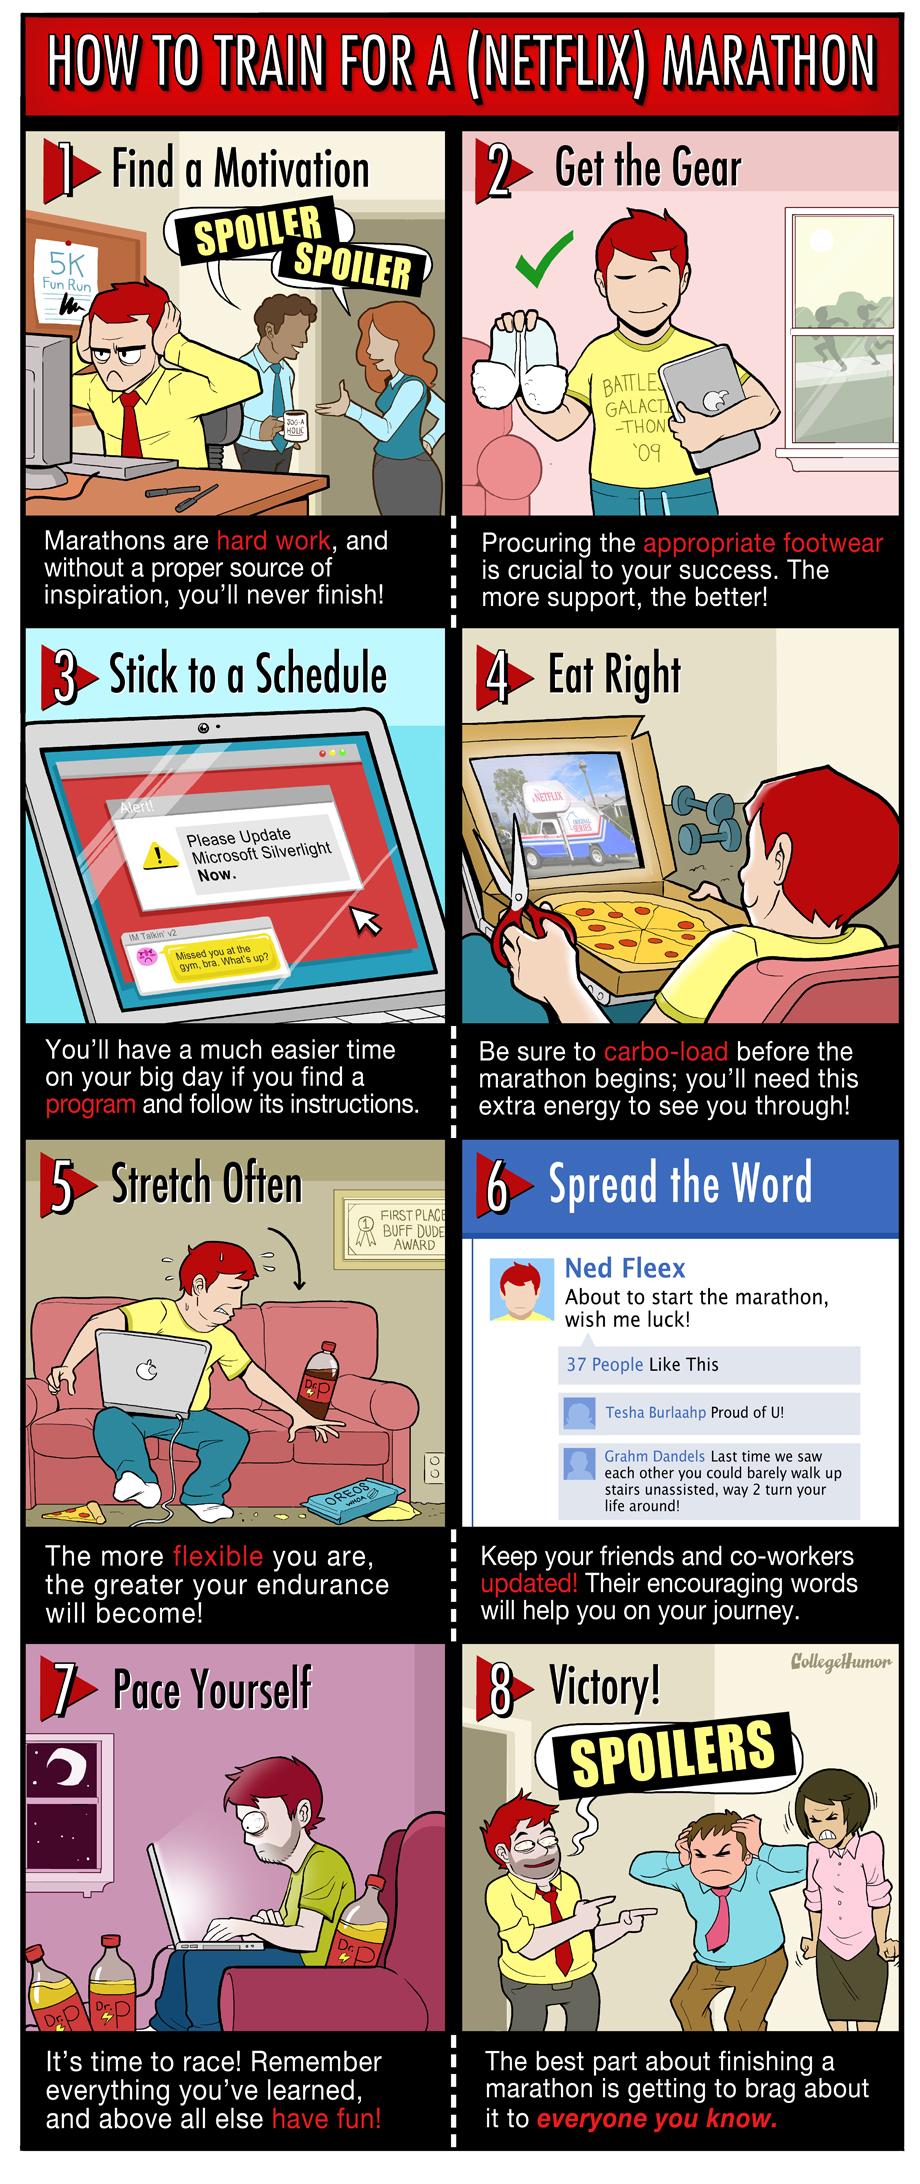 Protip: How to Train for a Netflix Marathon